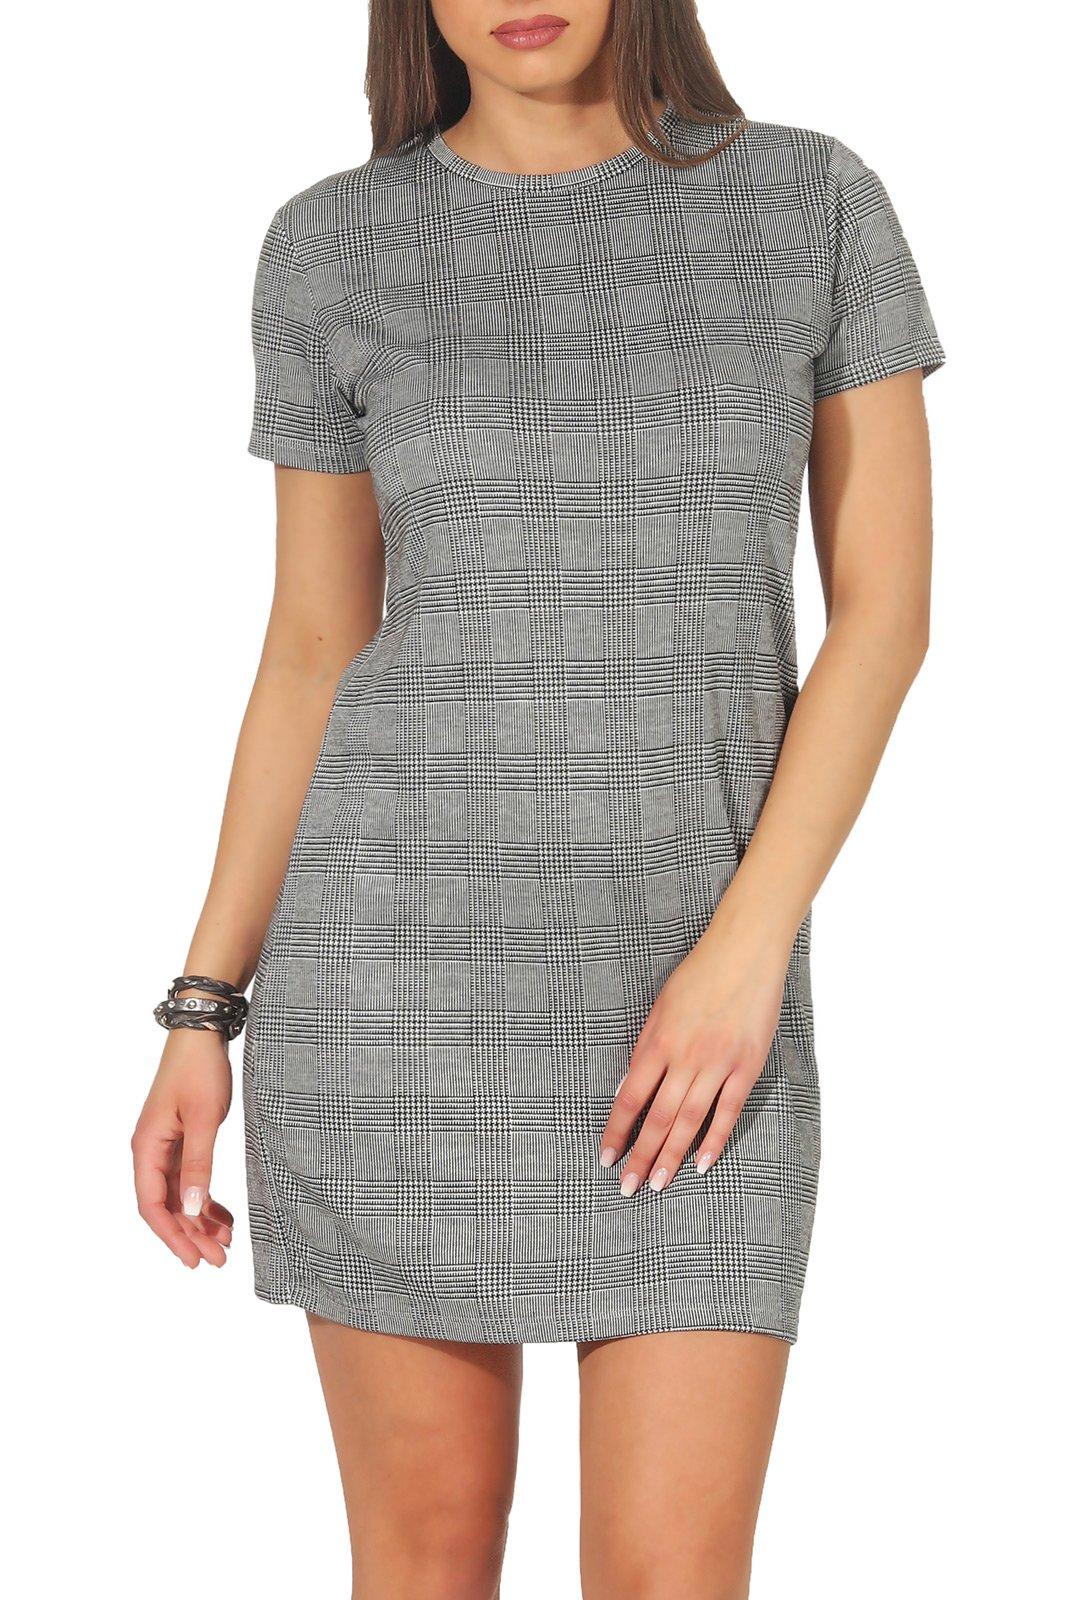 Damen Kleid Shirtkleid Minikleid Sommer Longshirt kariert Stitch ...